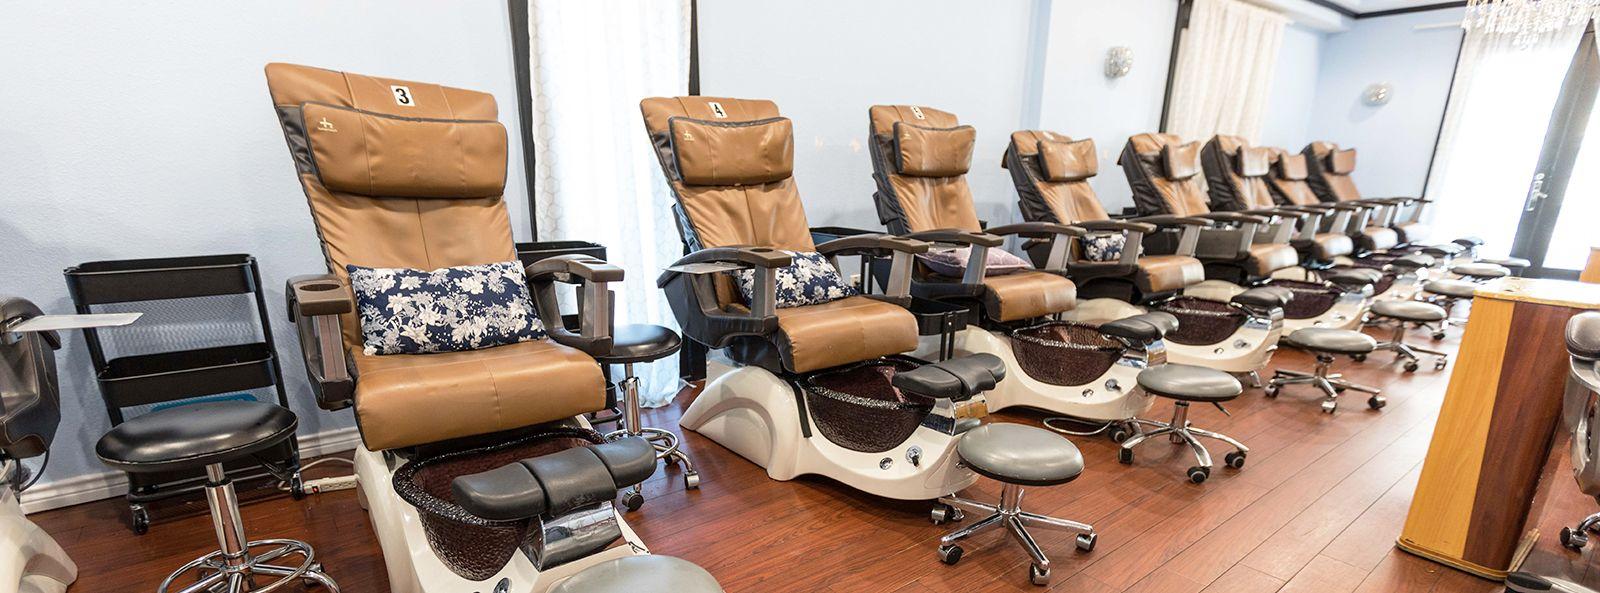 Nail salon Dallas Nail salon 75204 Uptown Nail Spa